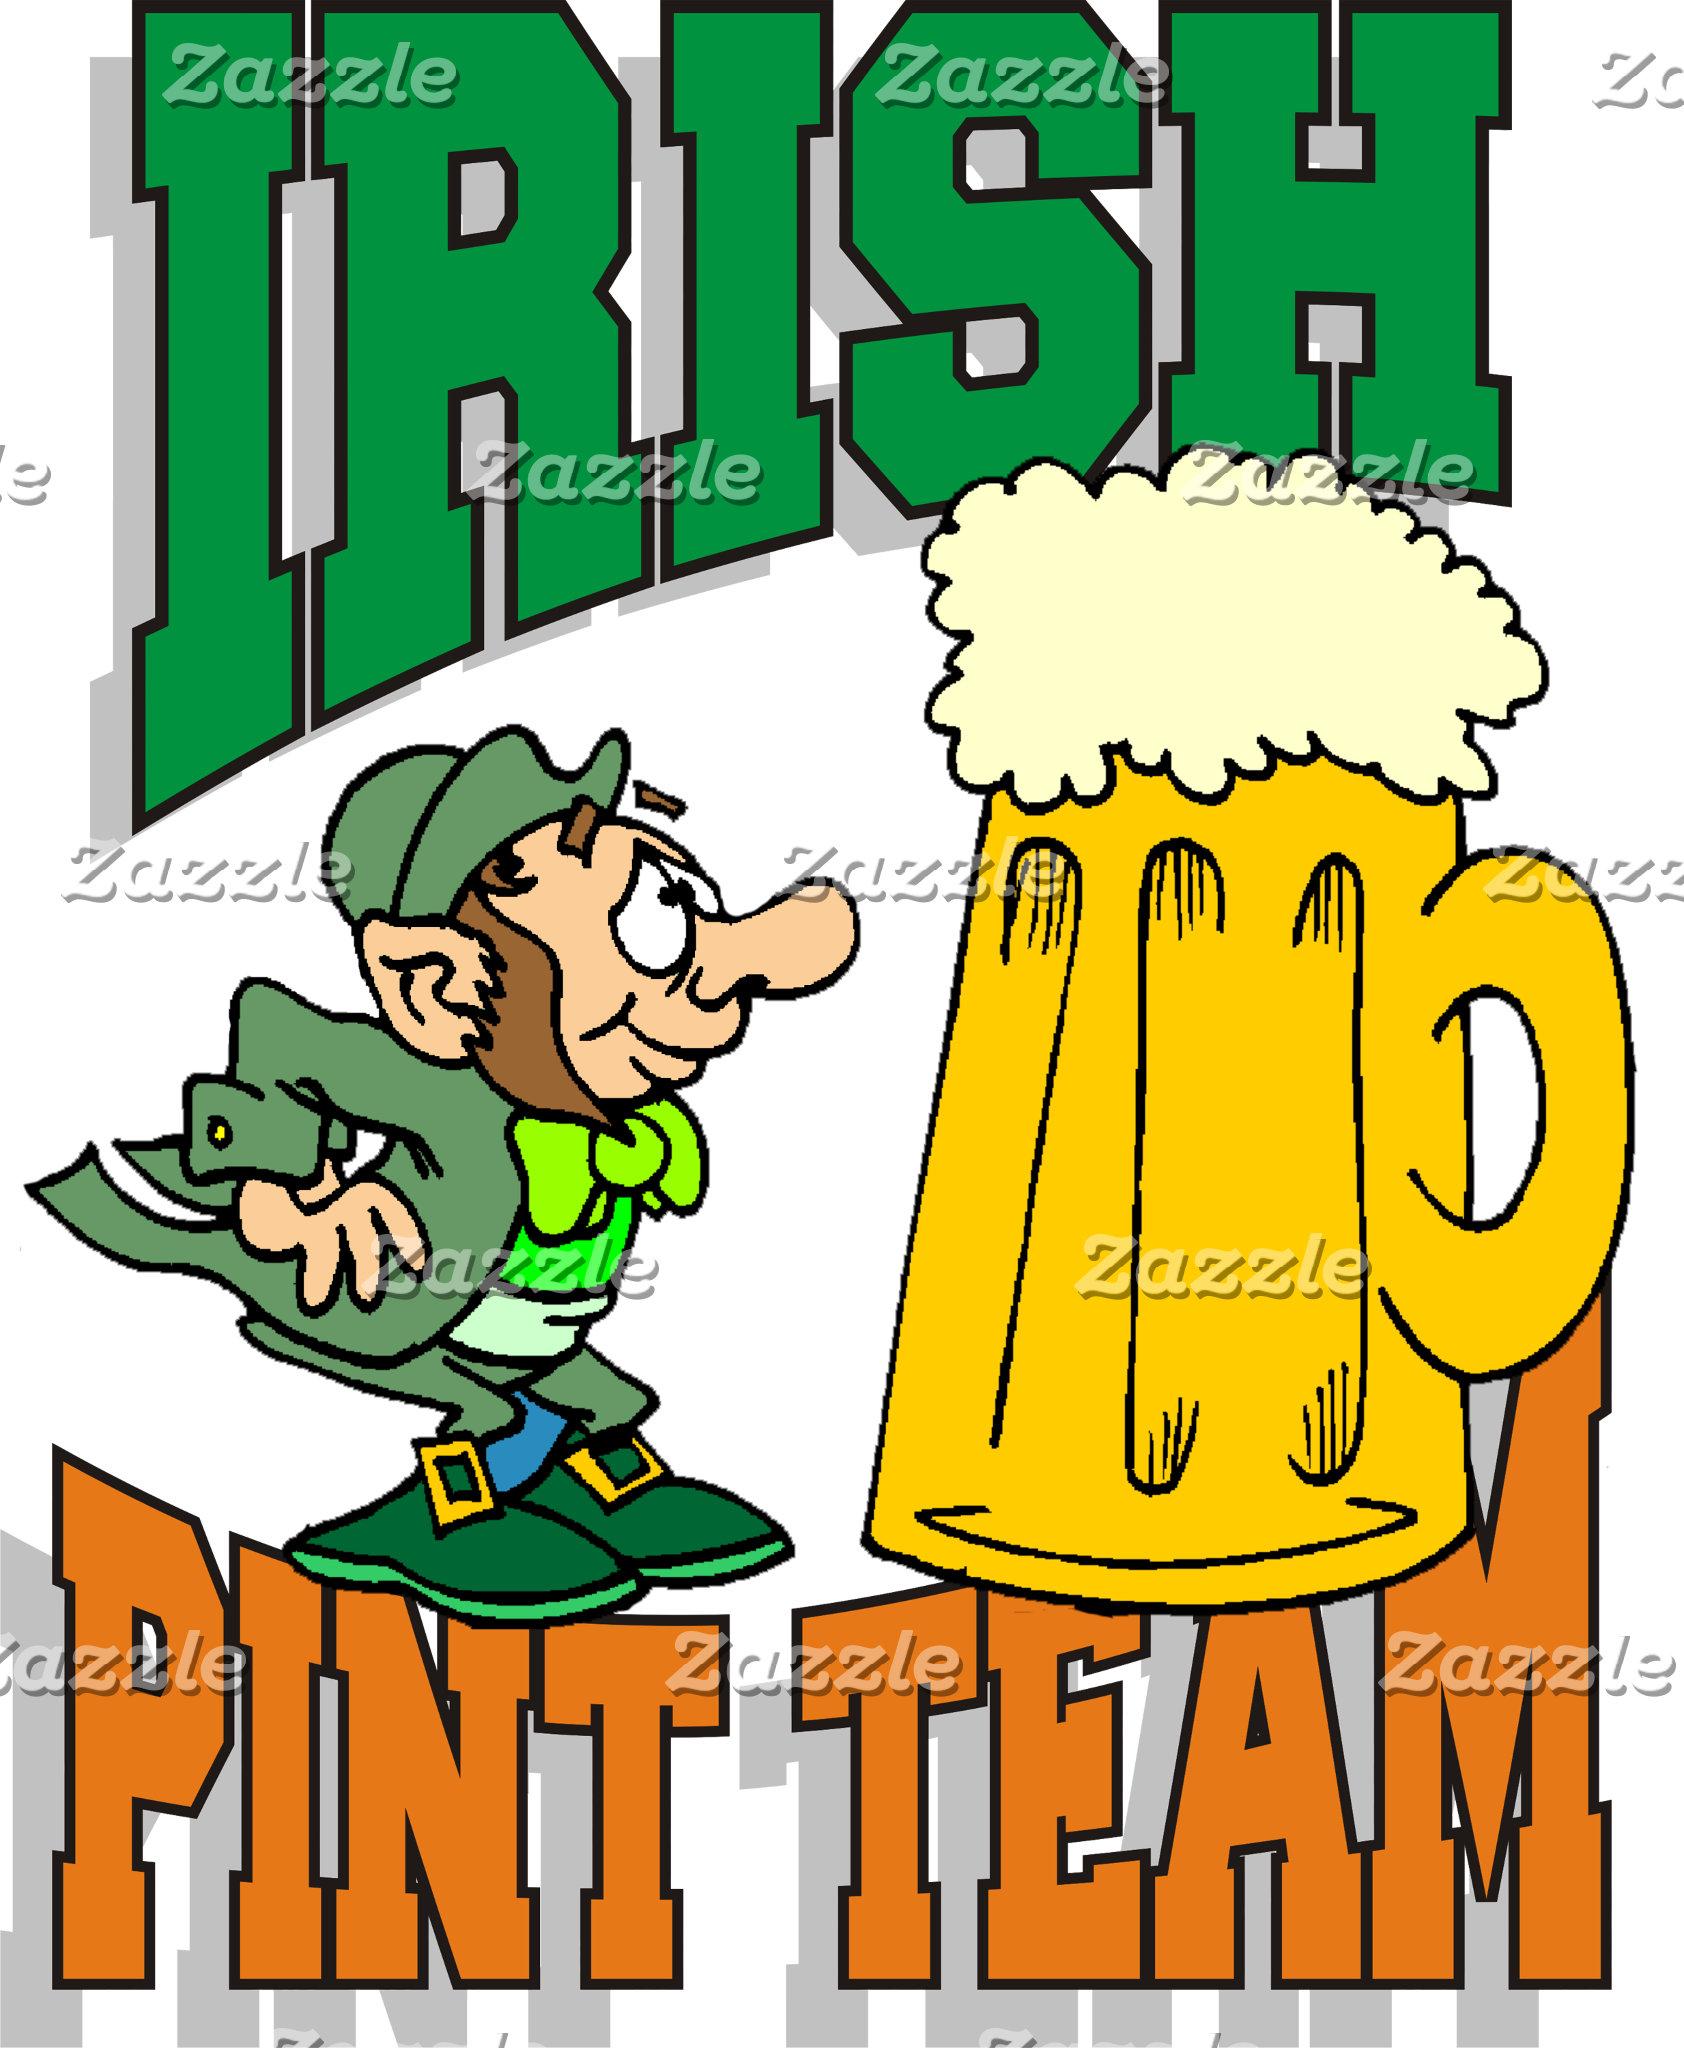 Funny Irish Pint Team T-Shirts Gifts Cards